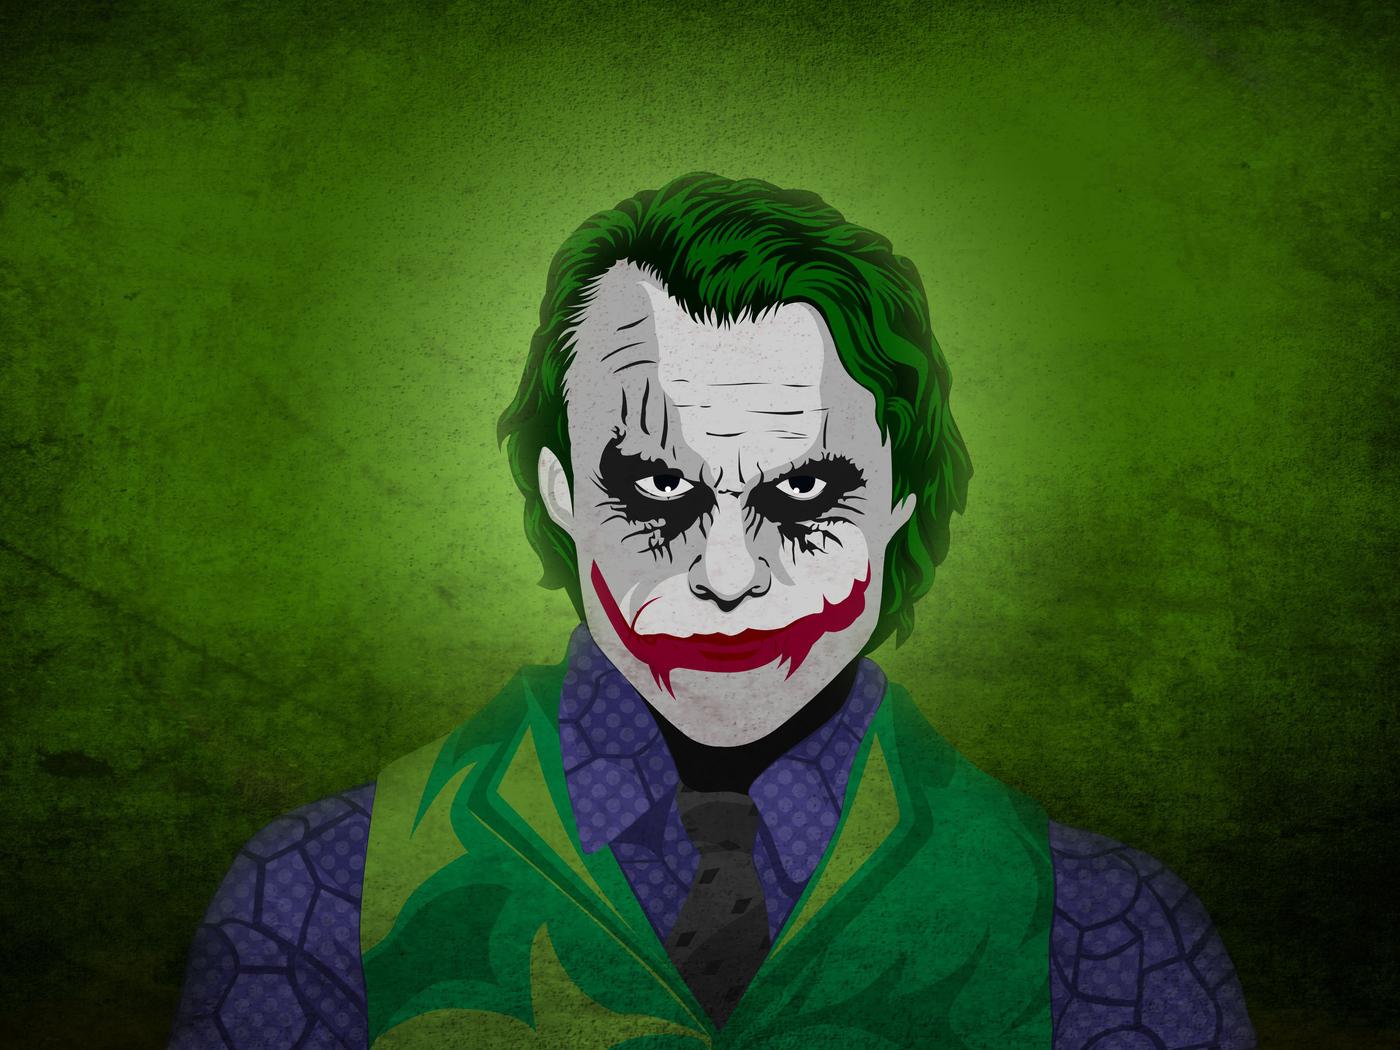 1400x1050 4k Joker 2020 Heath Ledger 1400x1050 Resolution ...